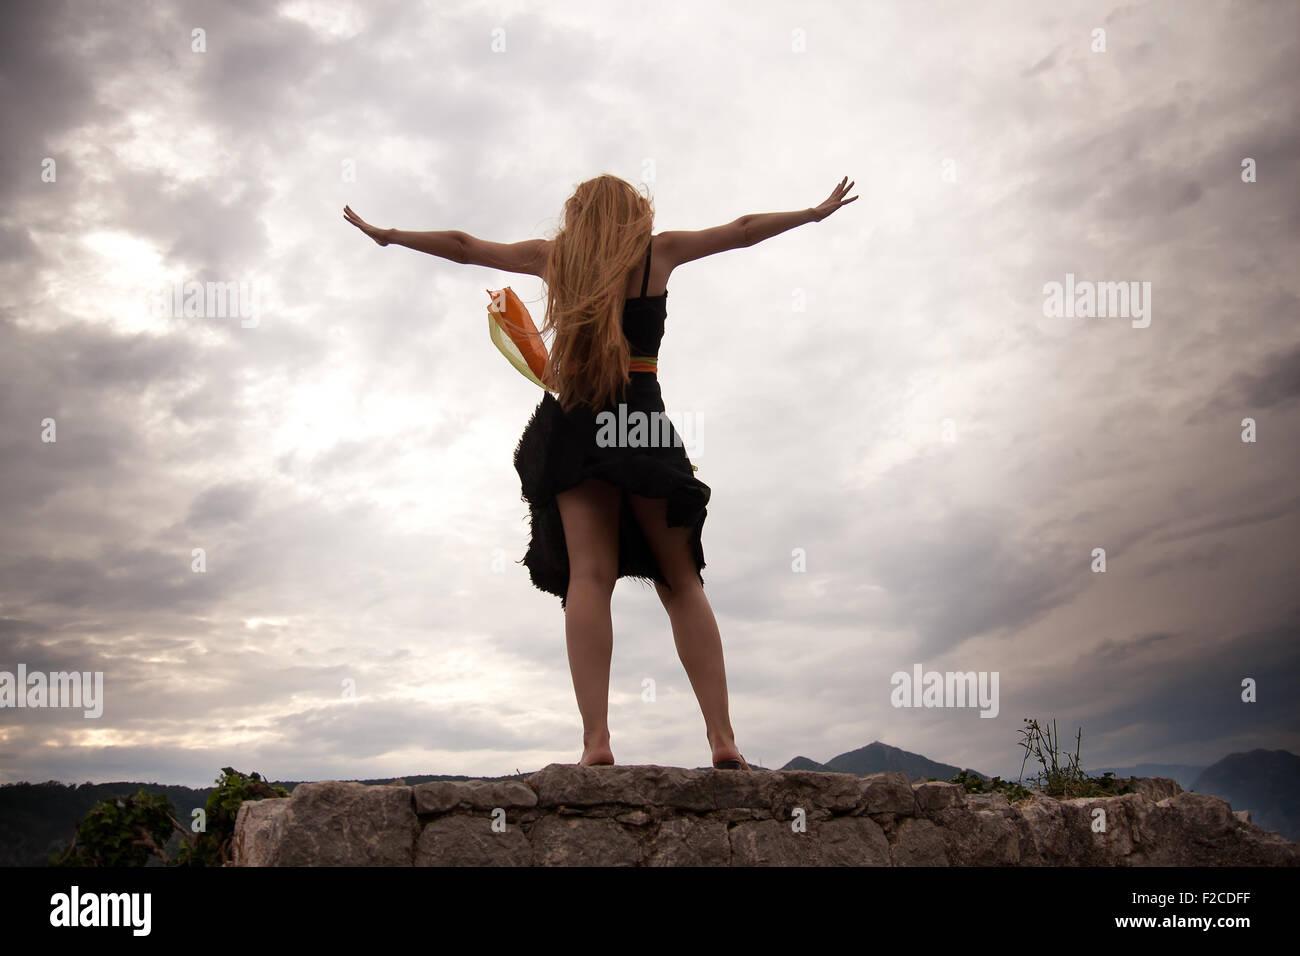 Freedom concept - adventurous woman on mountain peak - Stock Image